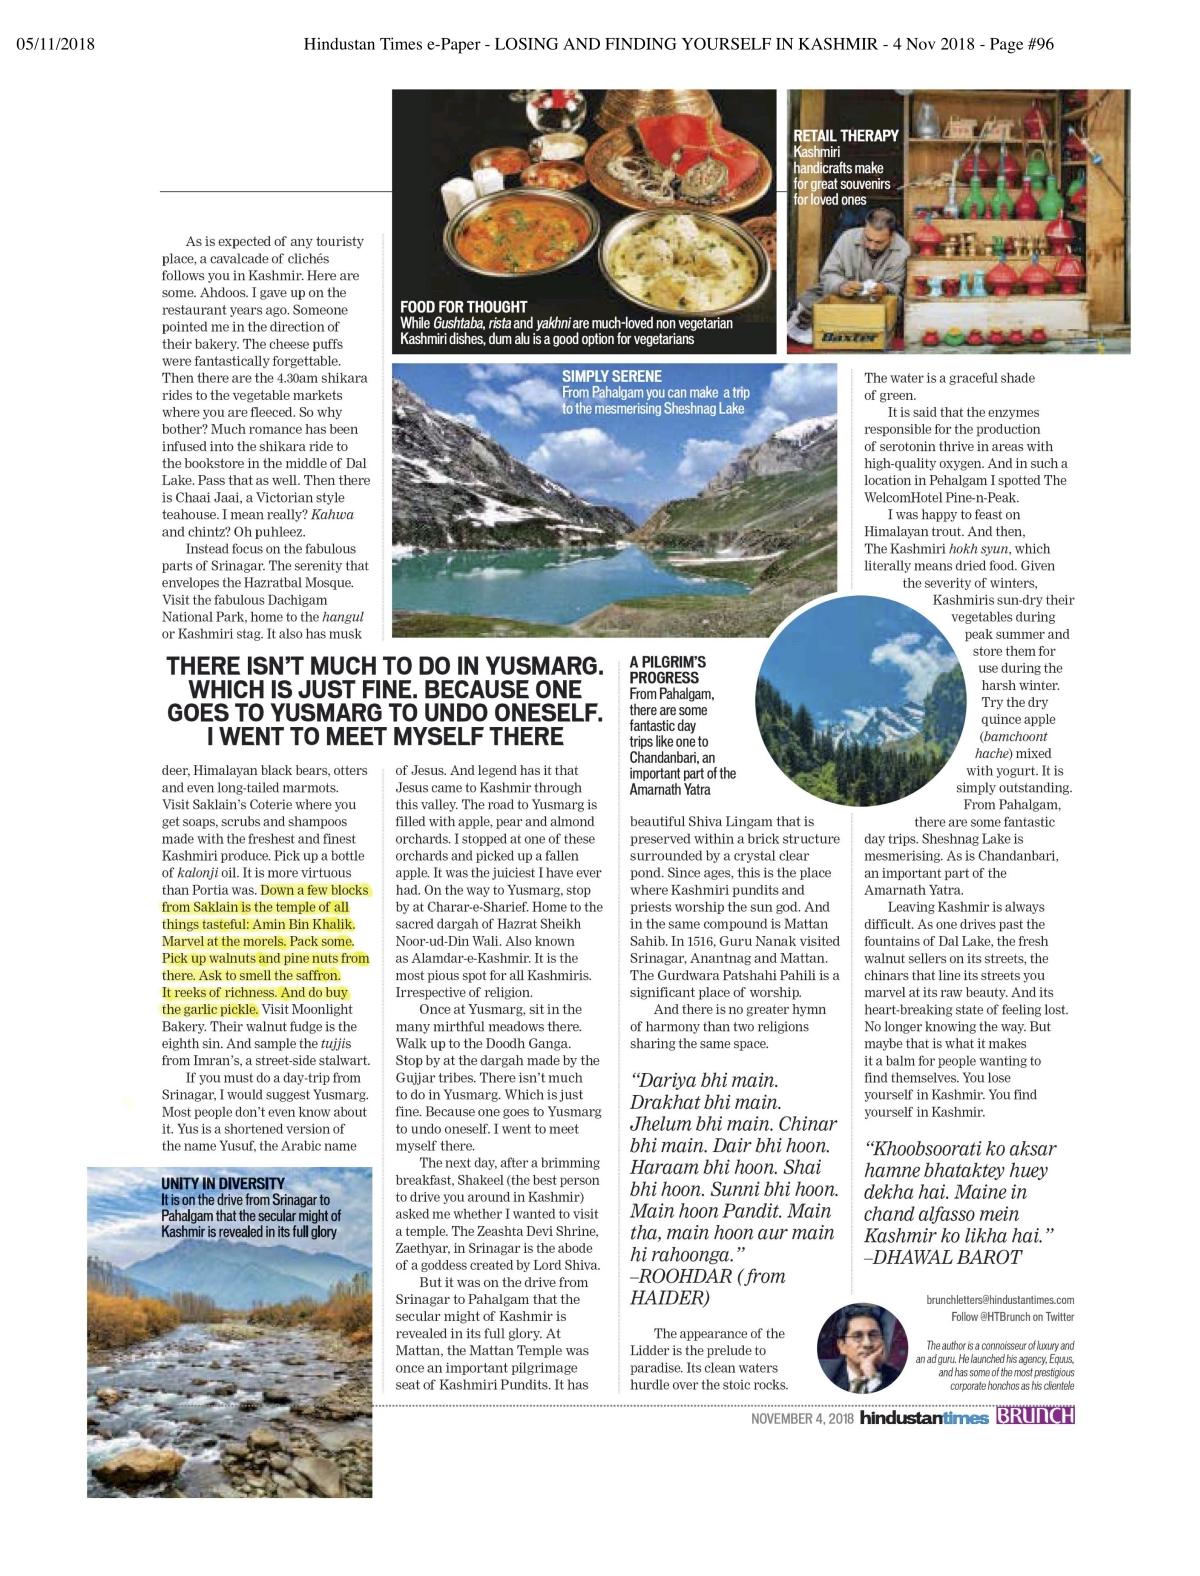 ABK-Hindustan-Times